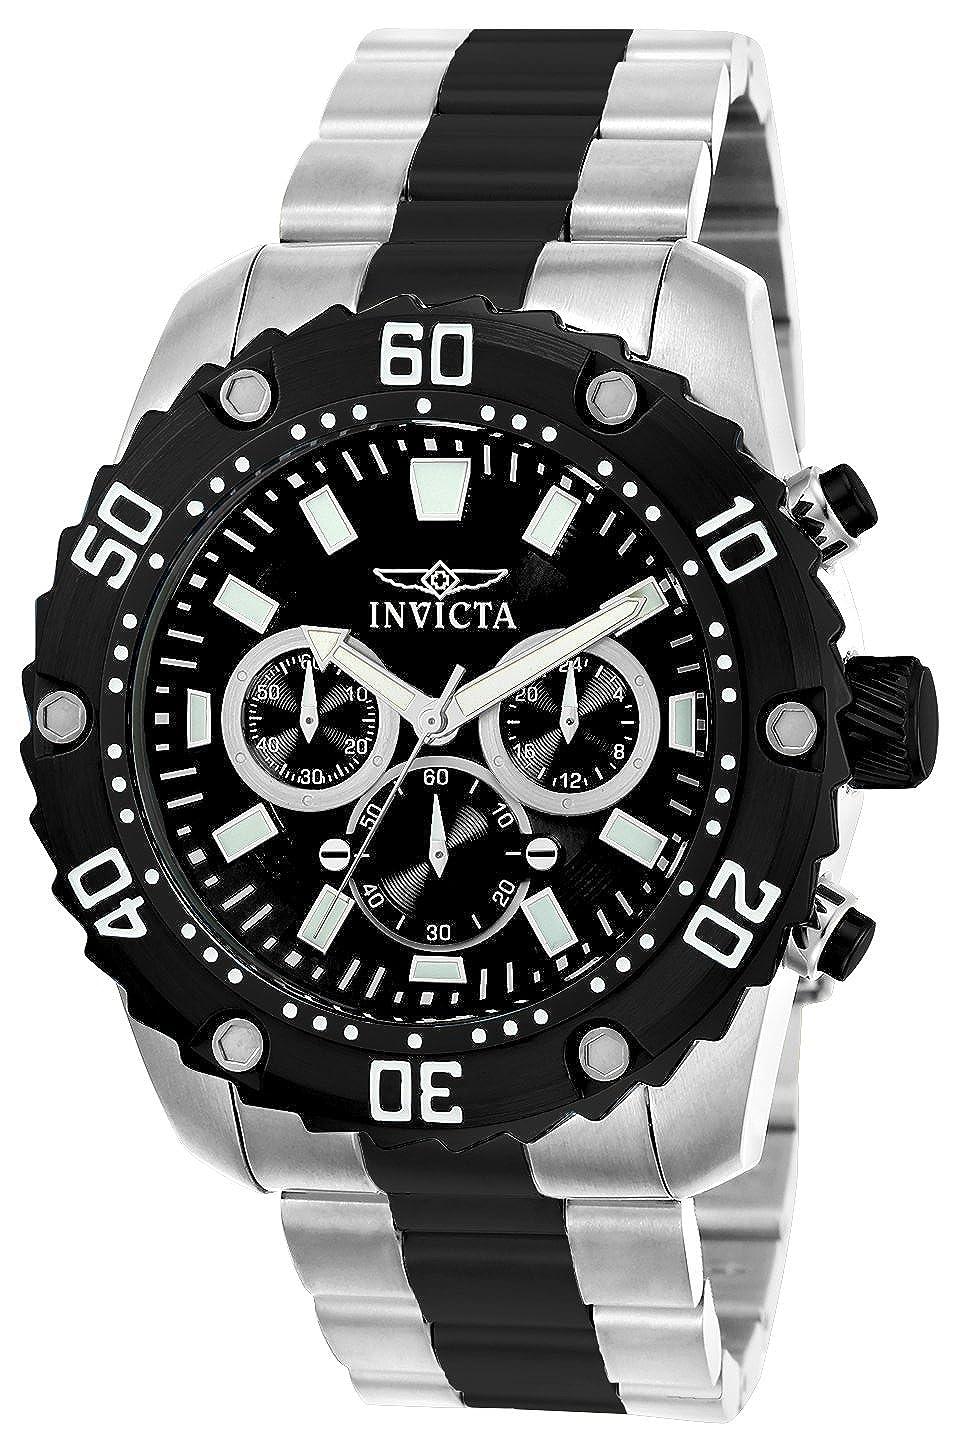 Invicta 22521 Pro Diver Reloj para Hombre acero inoxidable Cuarzo Esfera negro